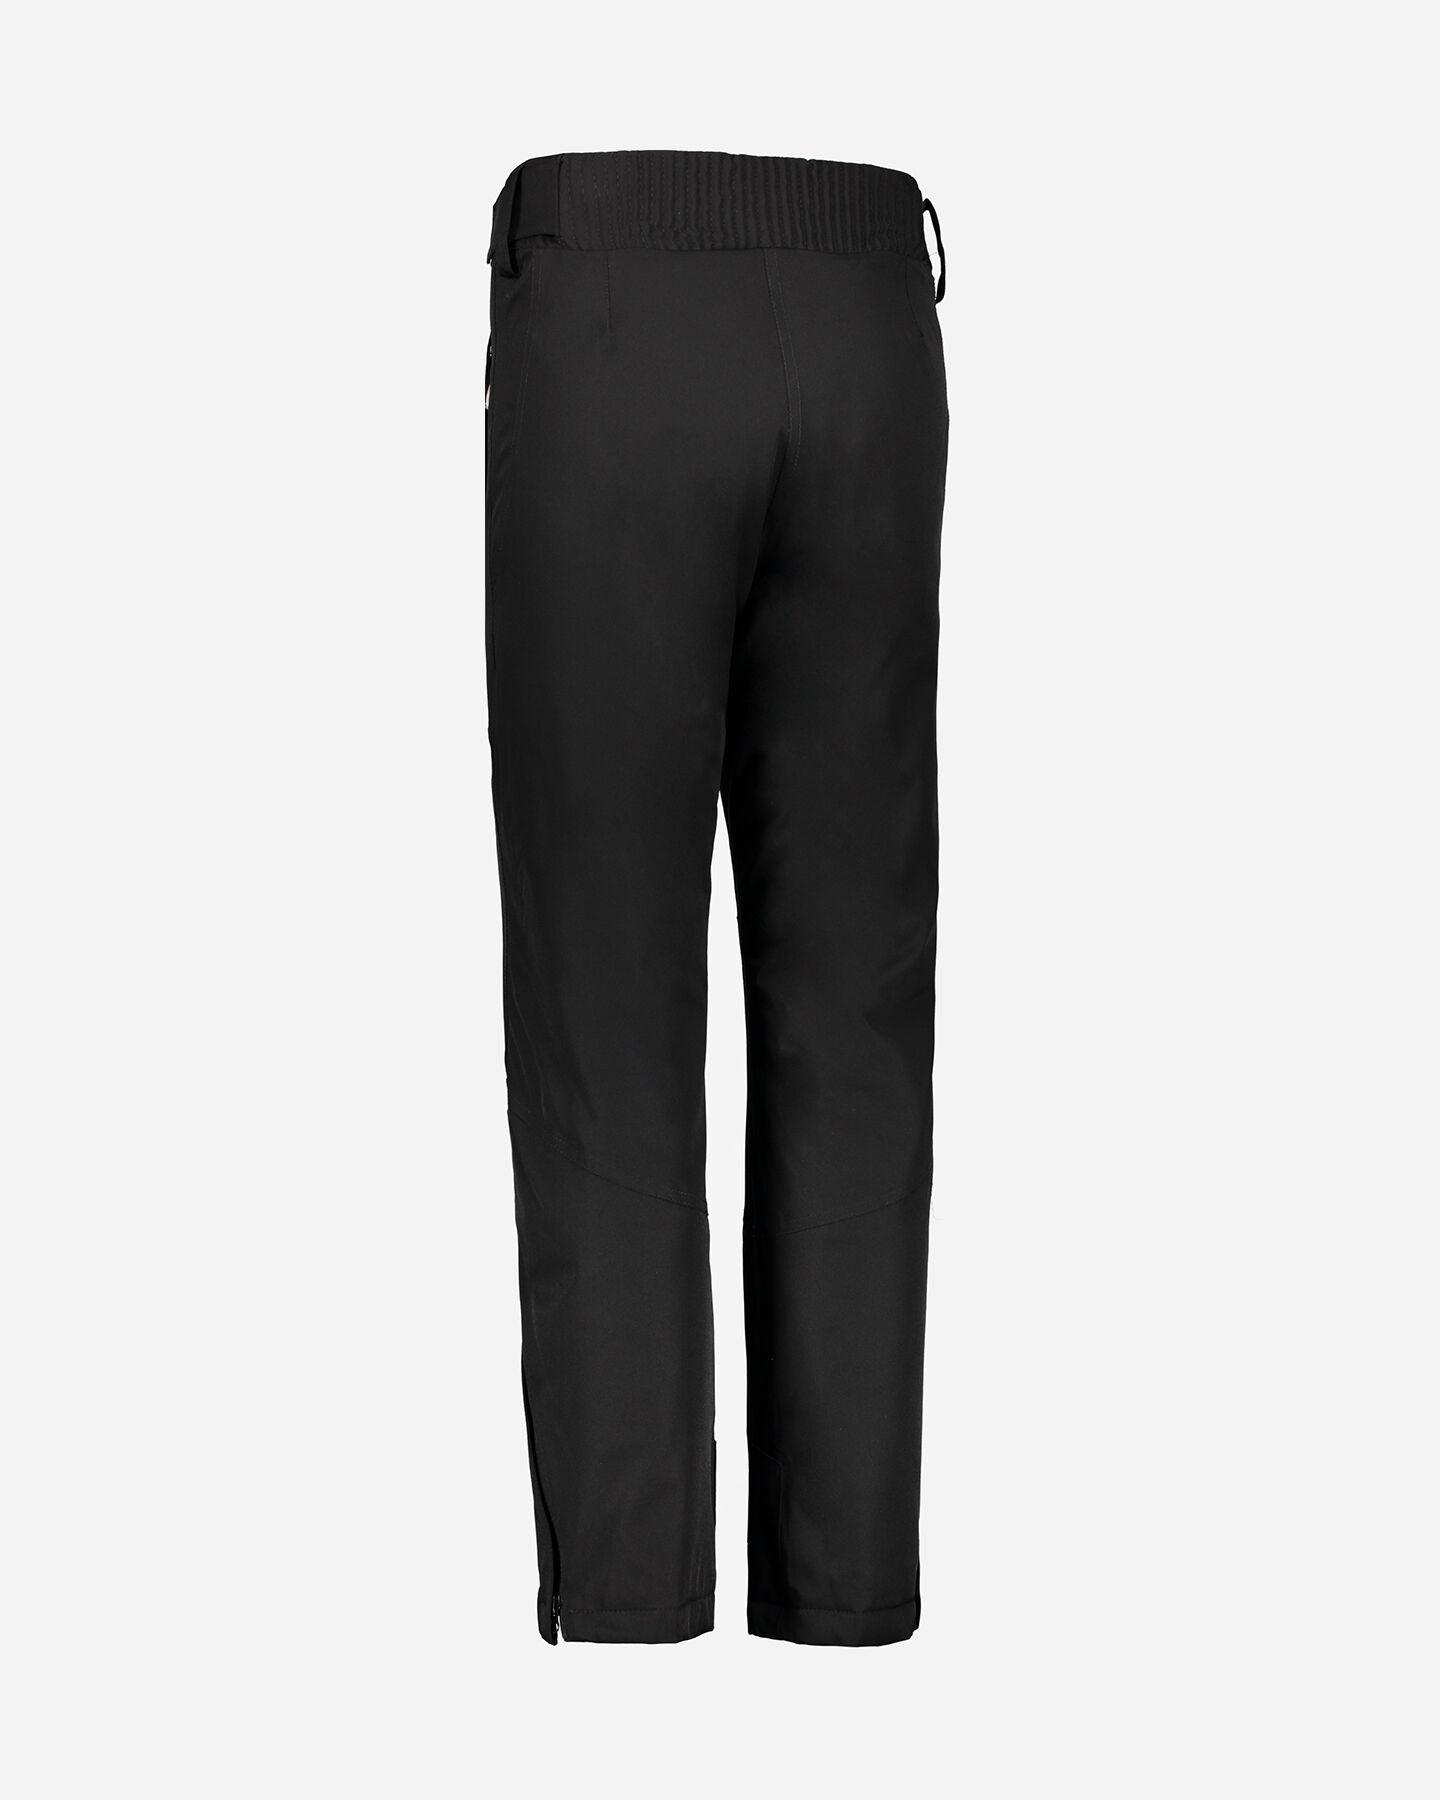 Pantalone sci ELLESSE SKI PANT W S4029977 scatto 5